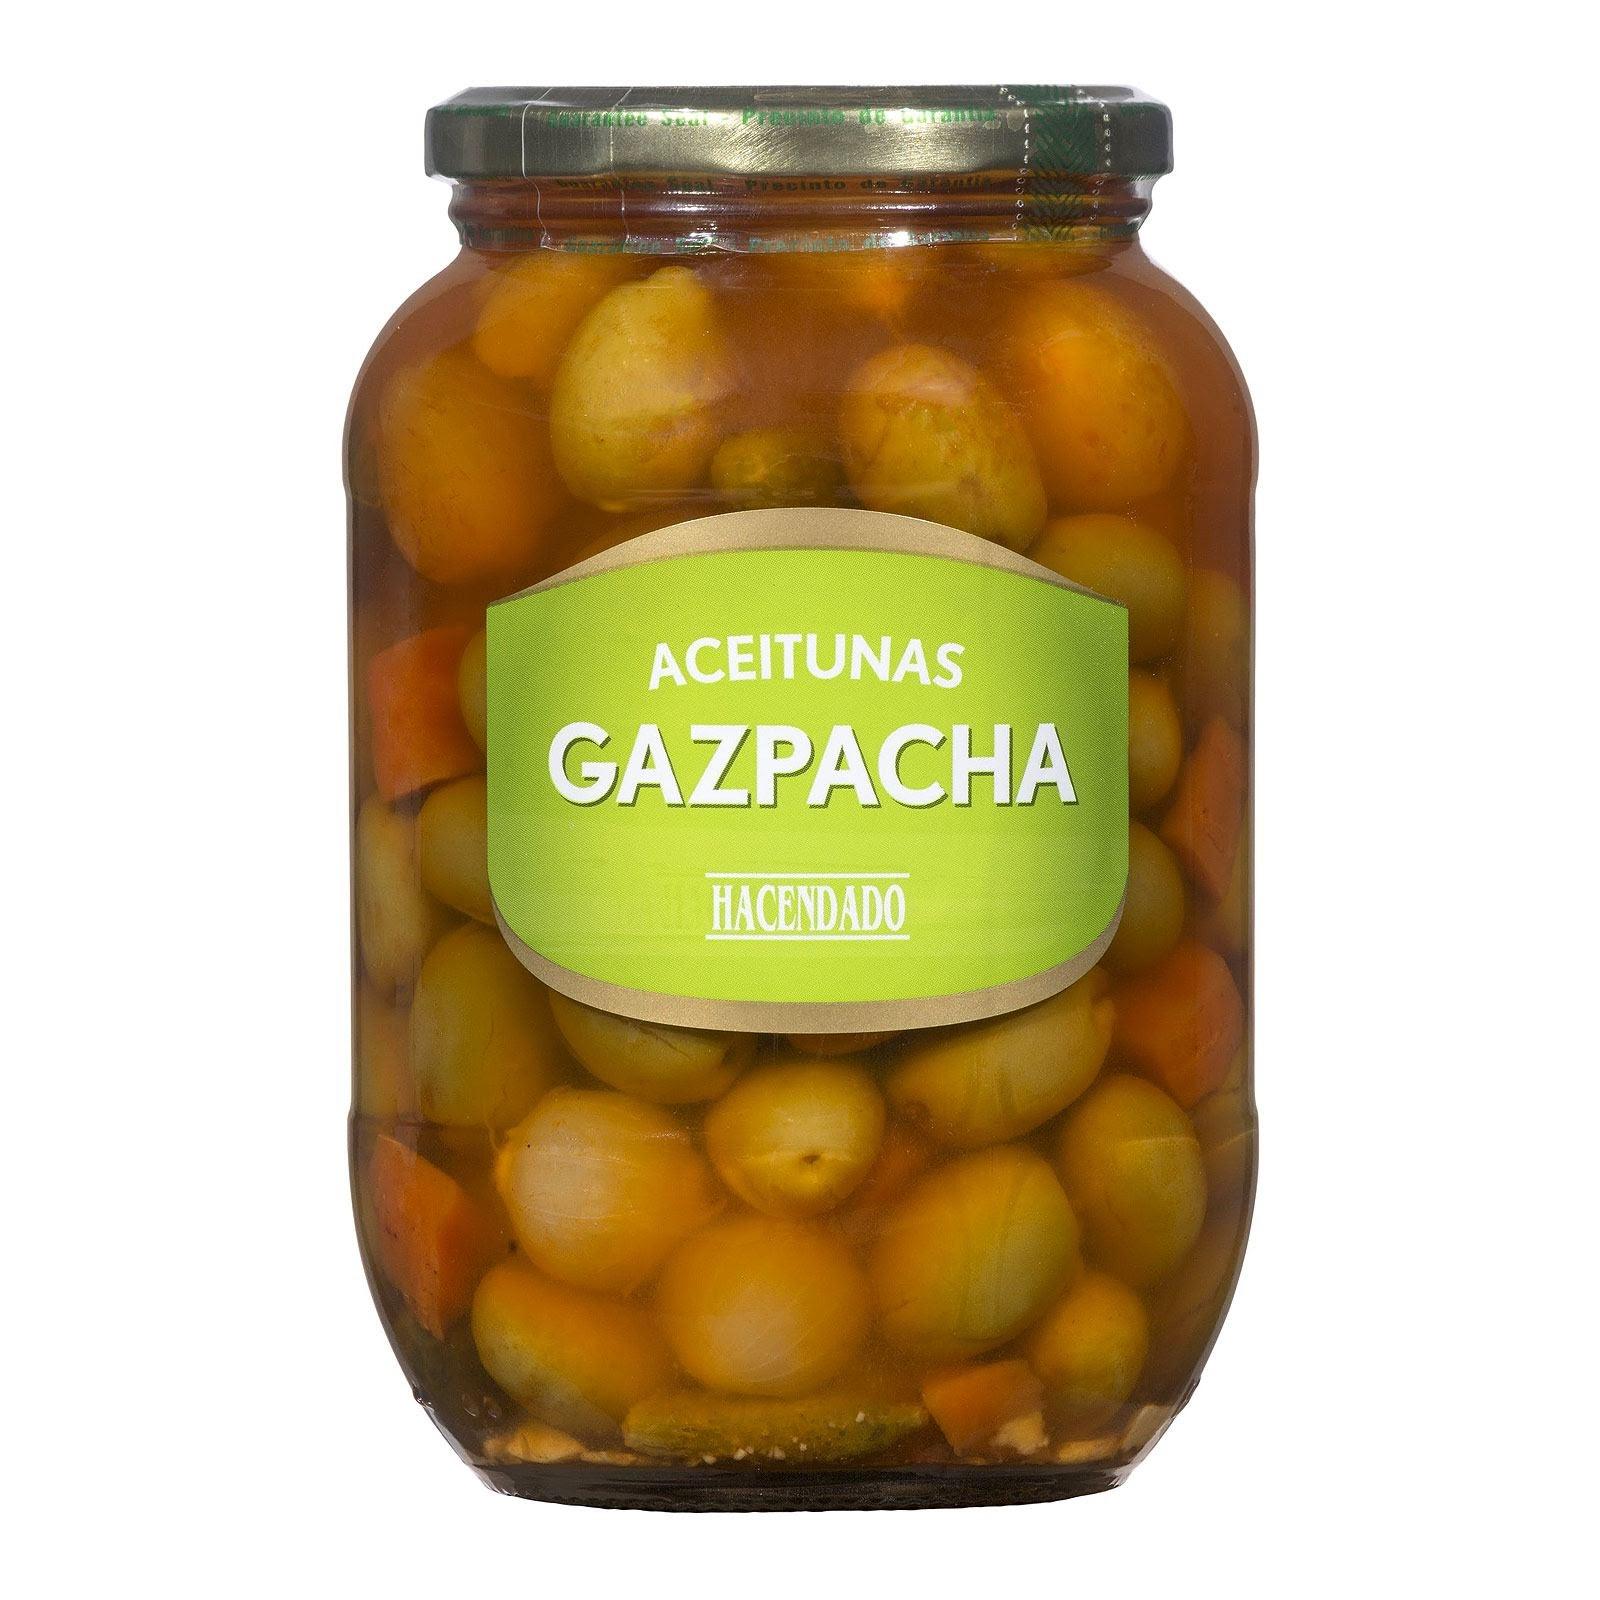 Aceitunas verdes gazpacha Hacendado